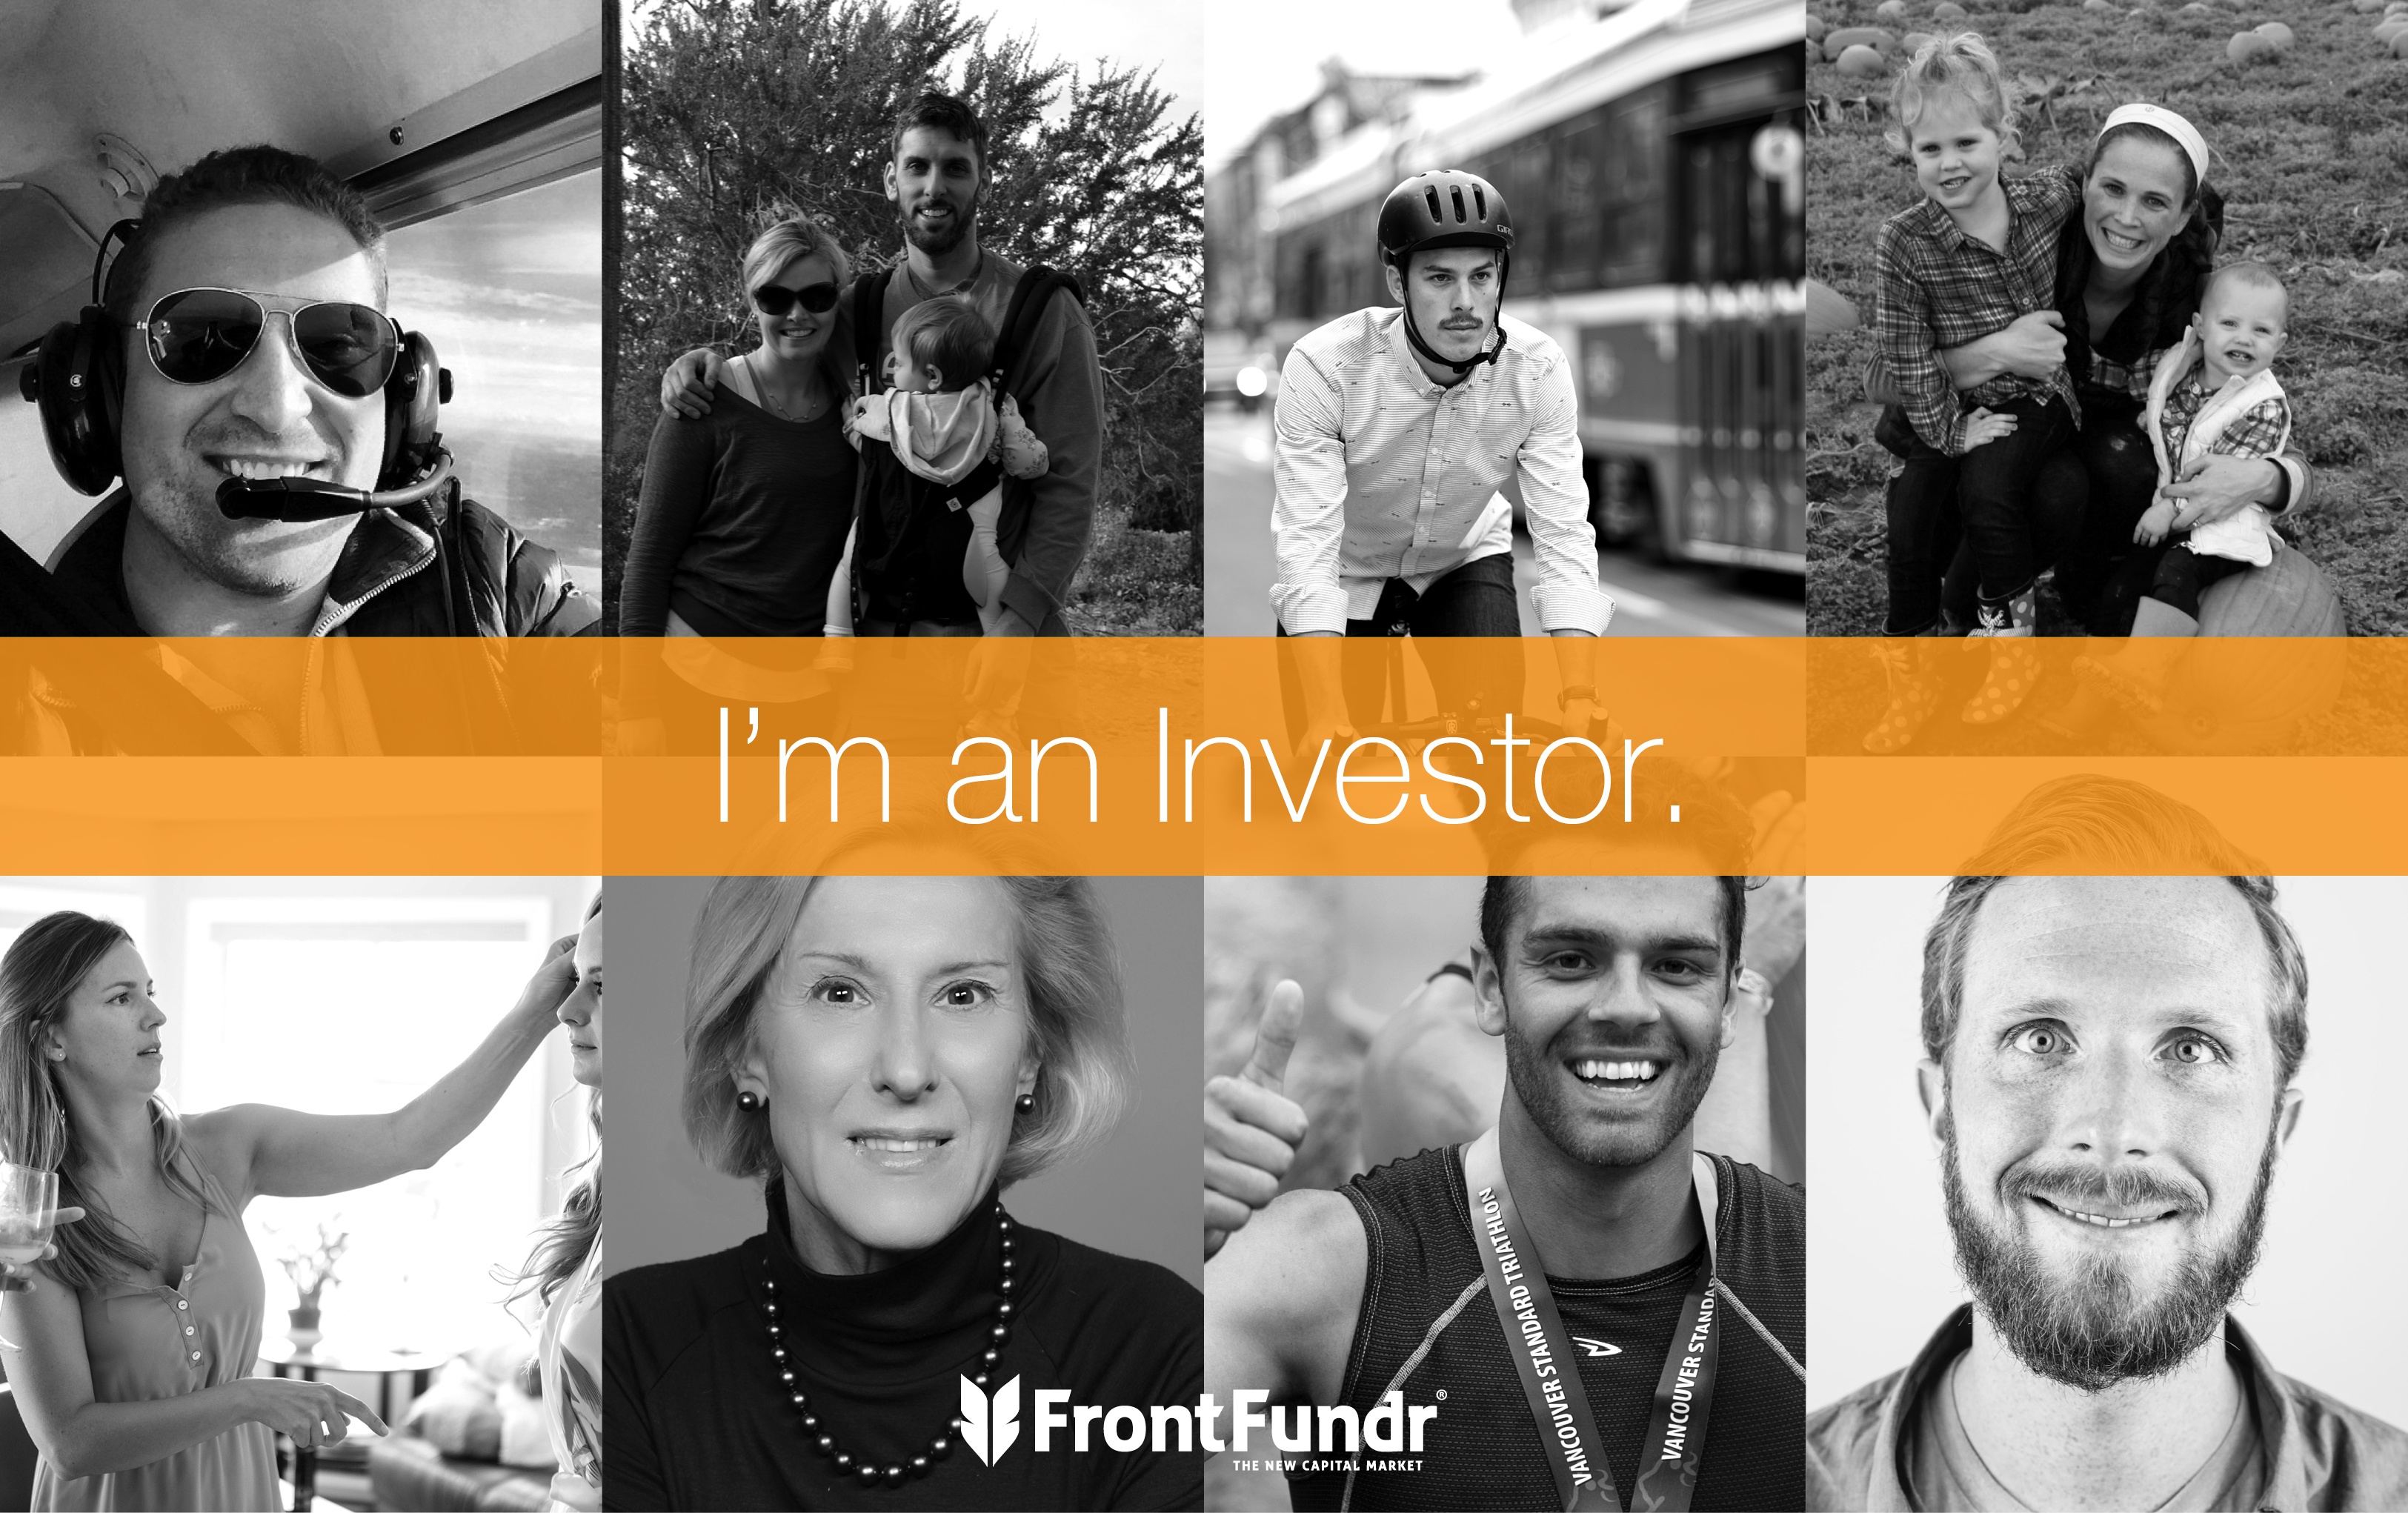 I'm-an-investor-all.jpg